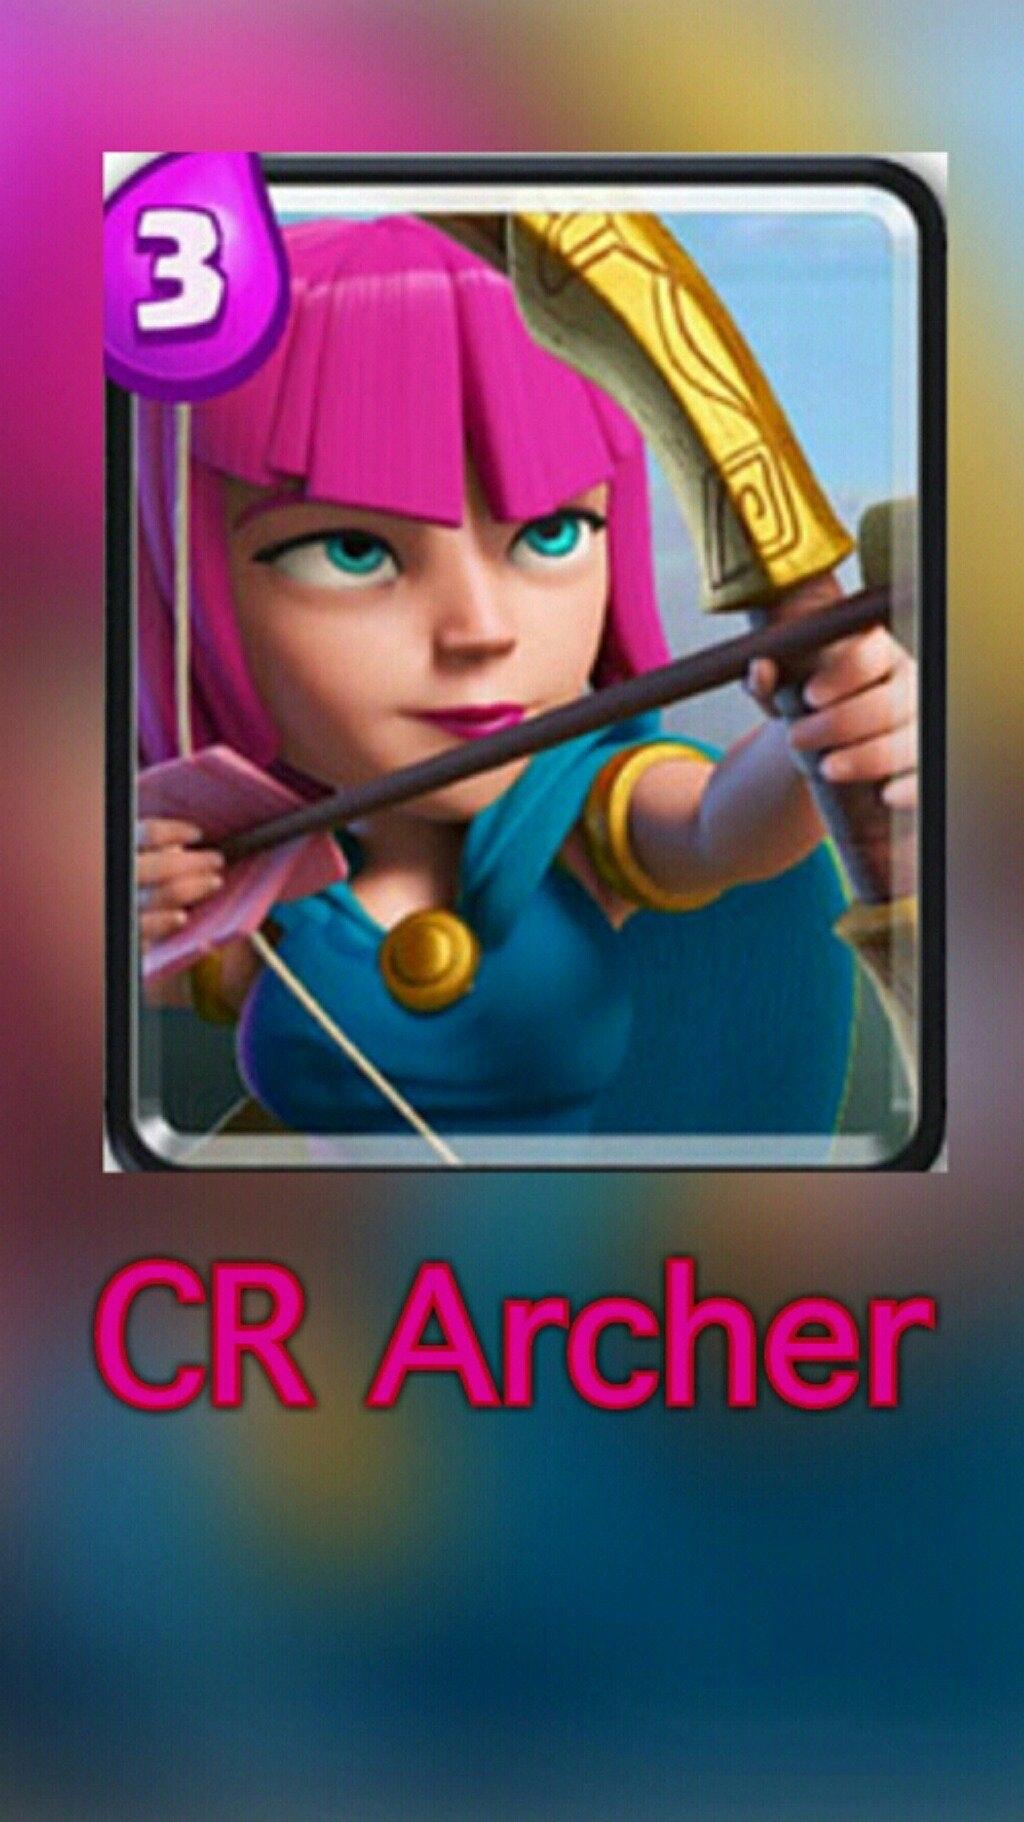 CR Archer